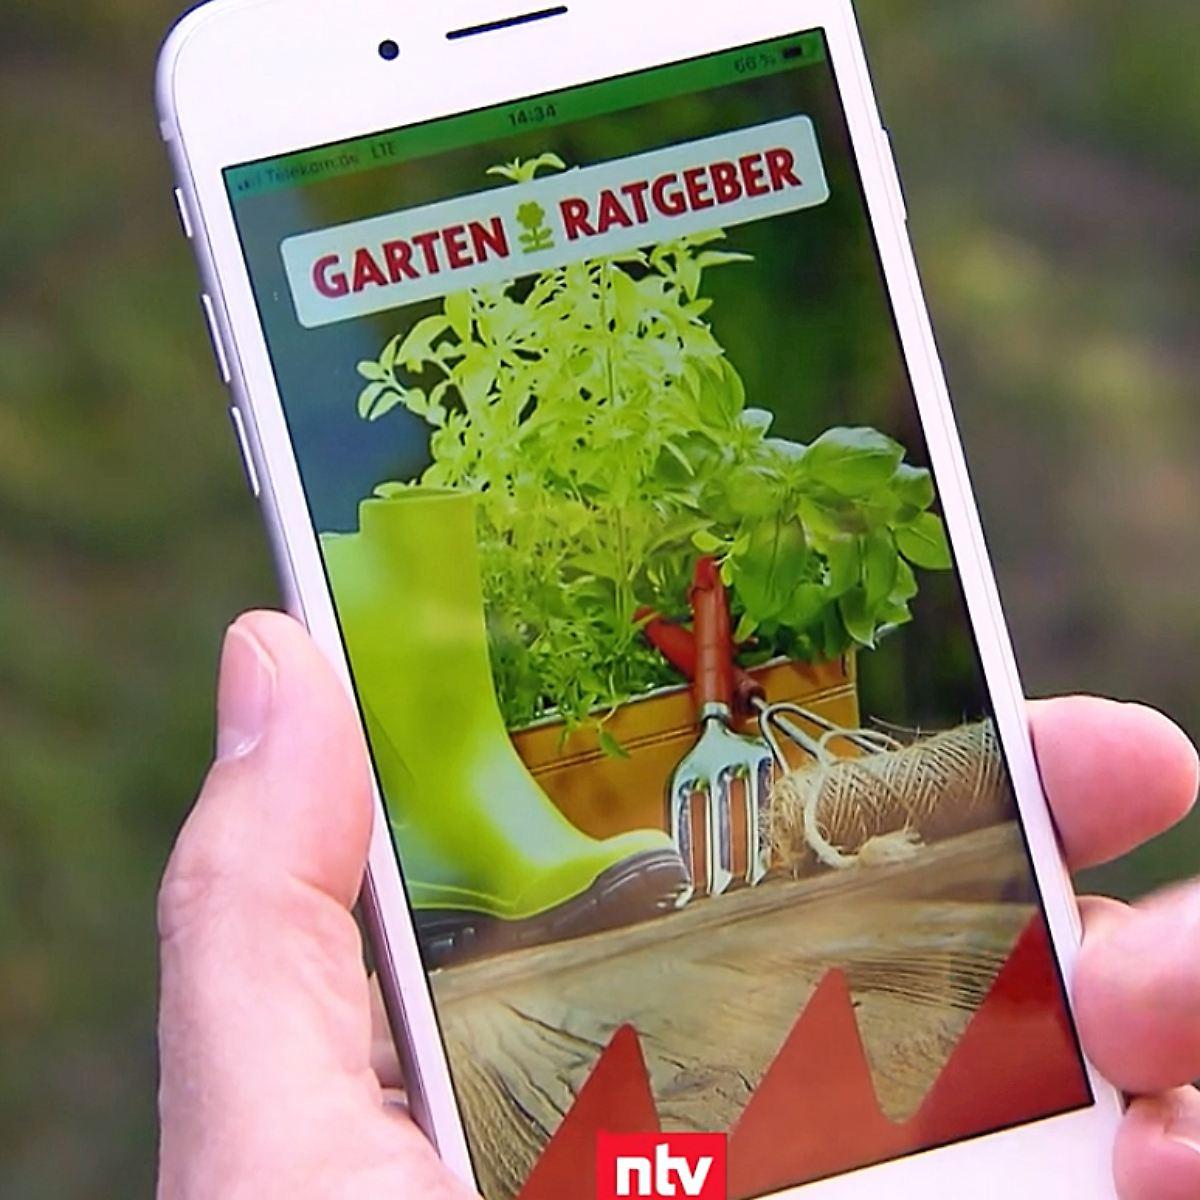 N Tv Ratgeber Empfehlenswerte Apps Fur Den Garten N Tv De